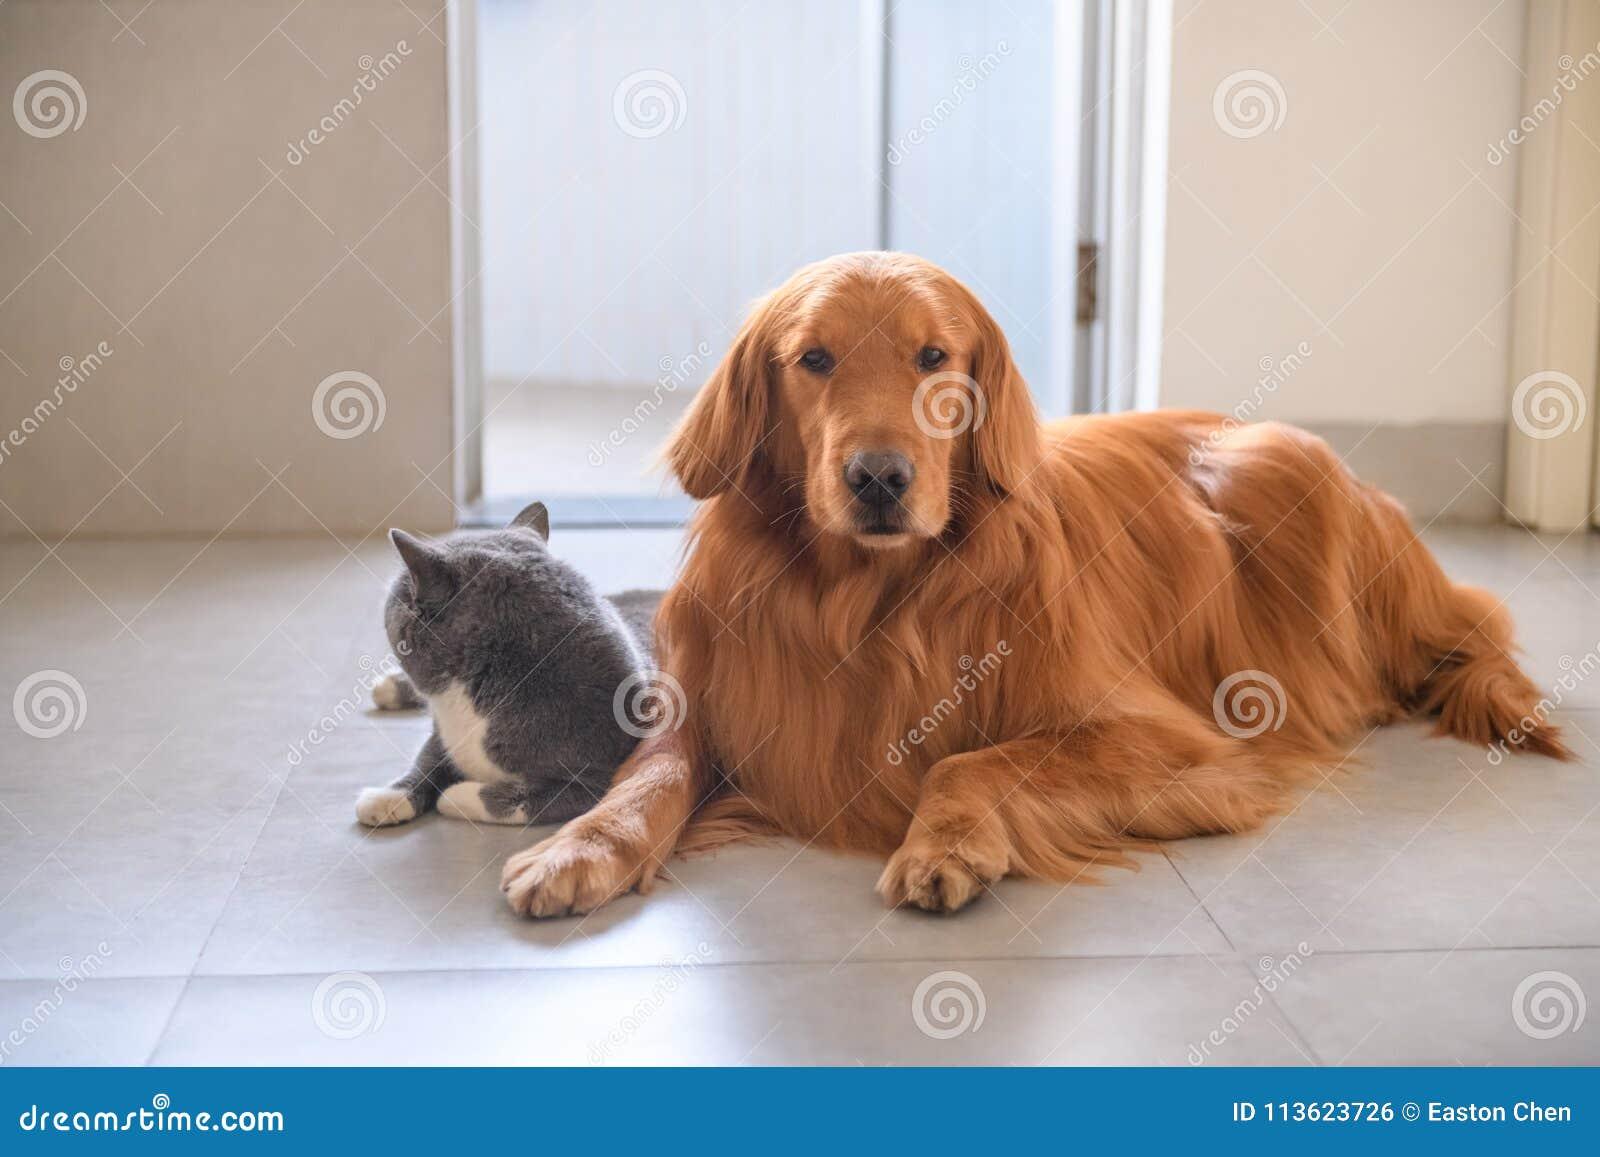 Golden Retriever And British Short Hair Cat Stock Photo Image Of Catindoor Hair 113623726